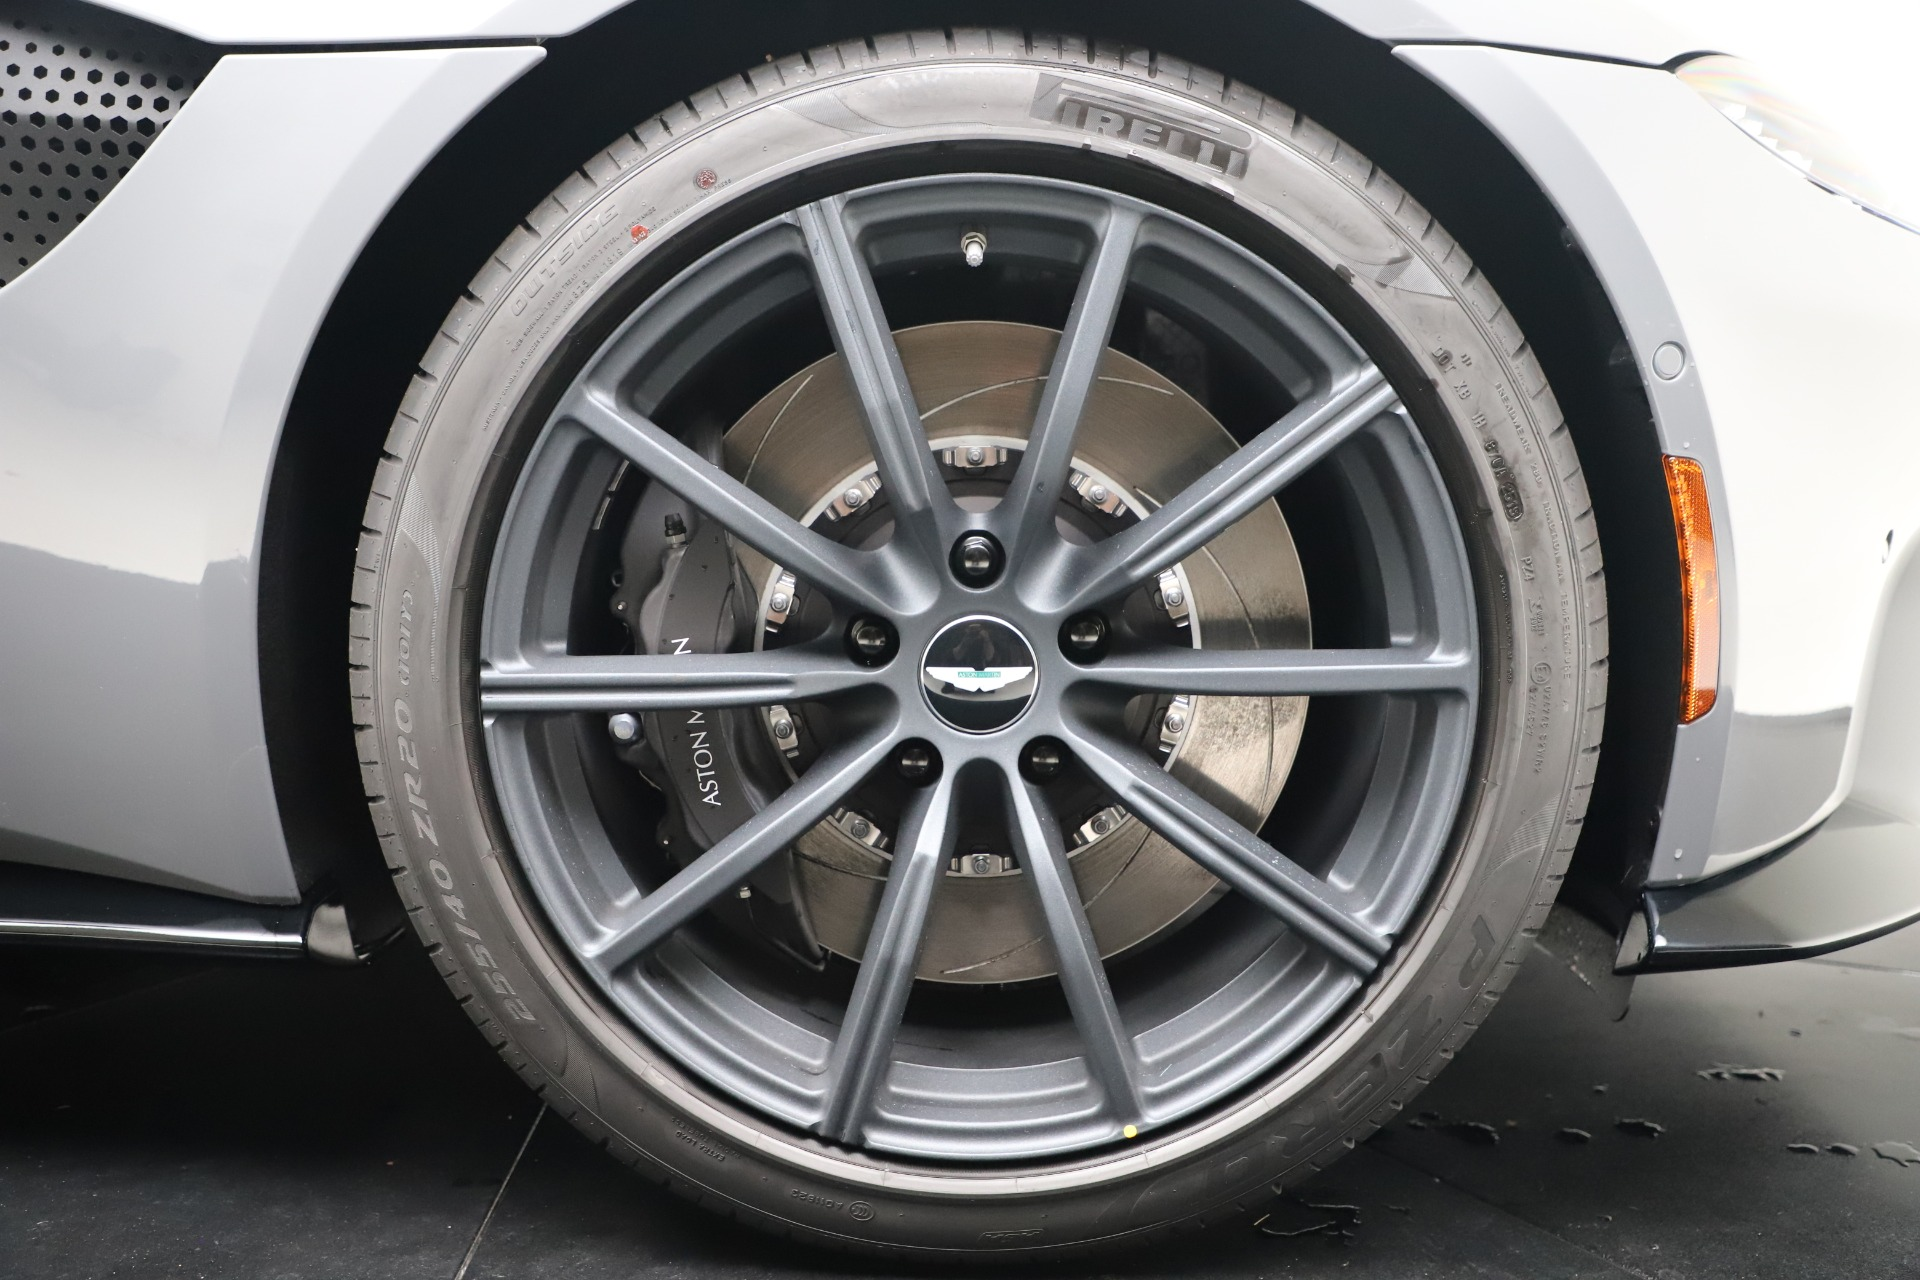 New 2020 Aston Martin Vantage V8 For Sale In Greenwich, CT 3482_p41